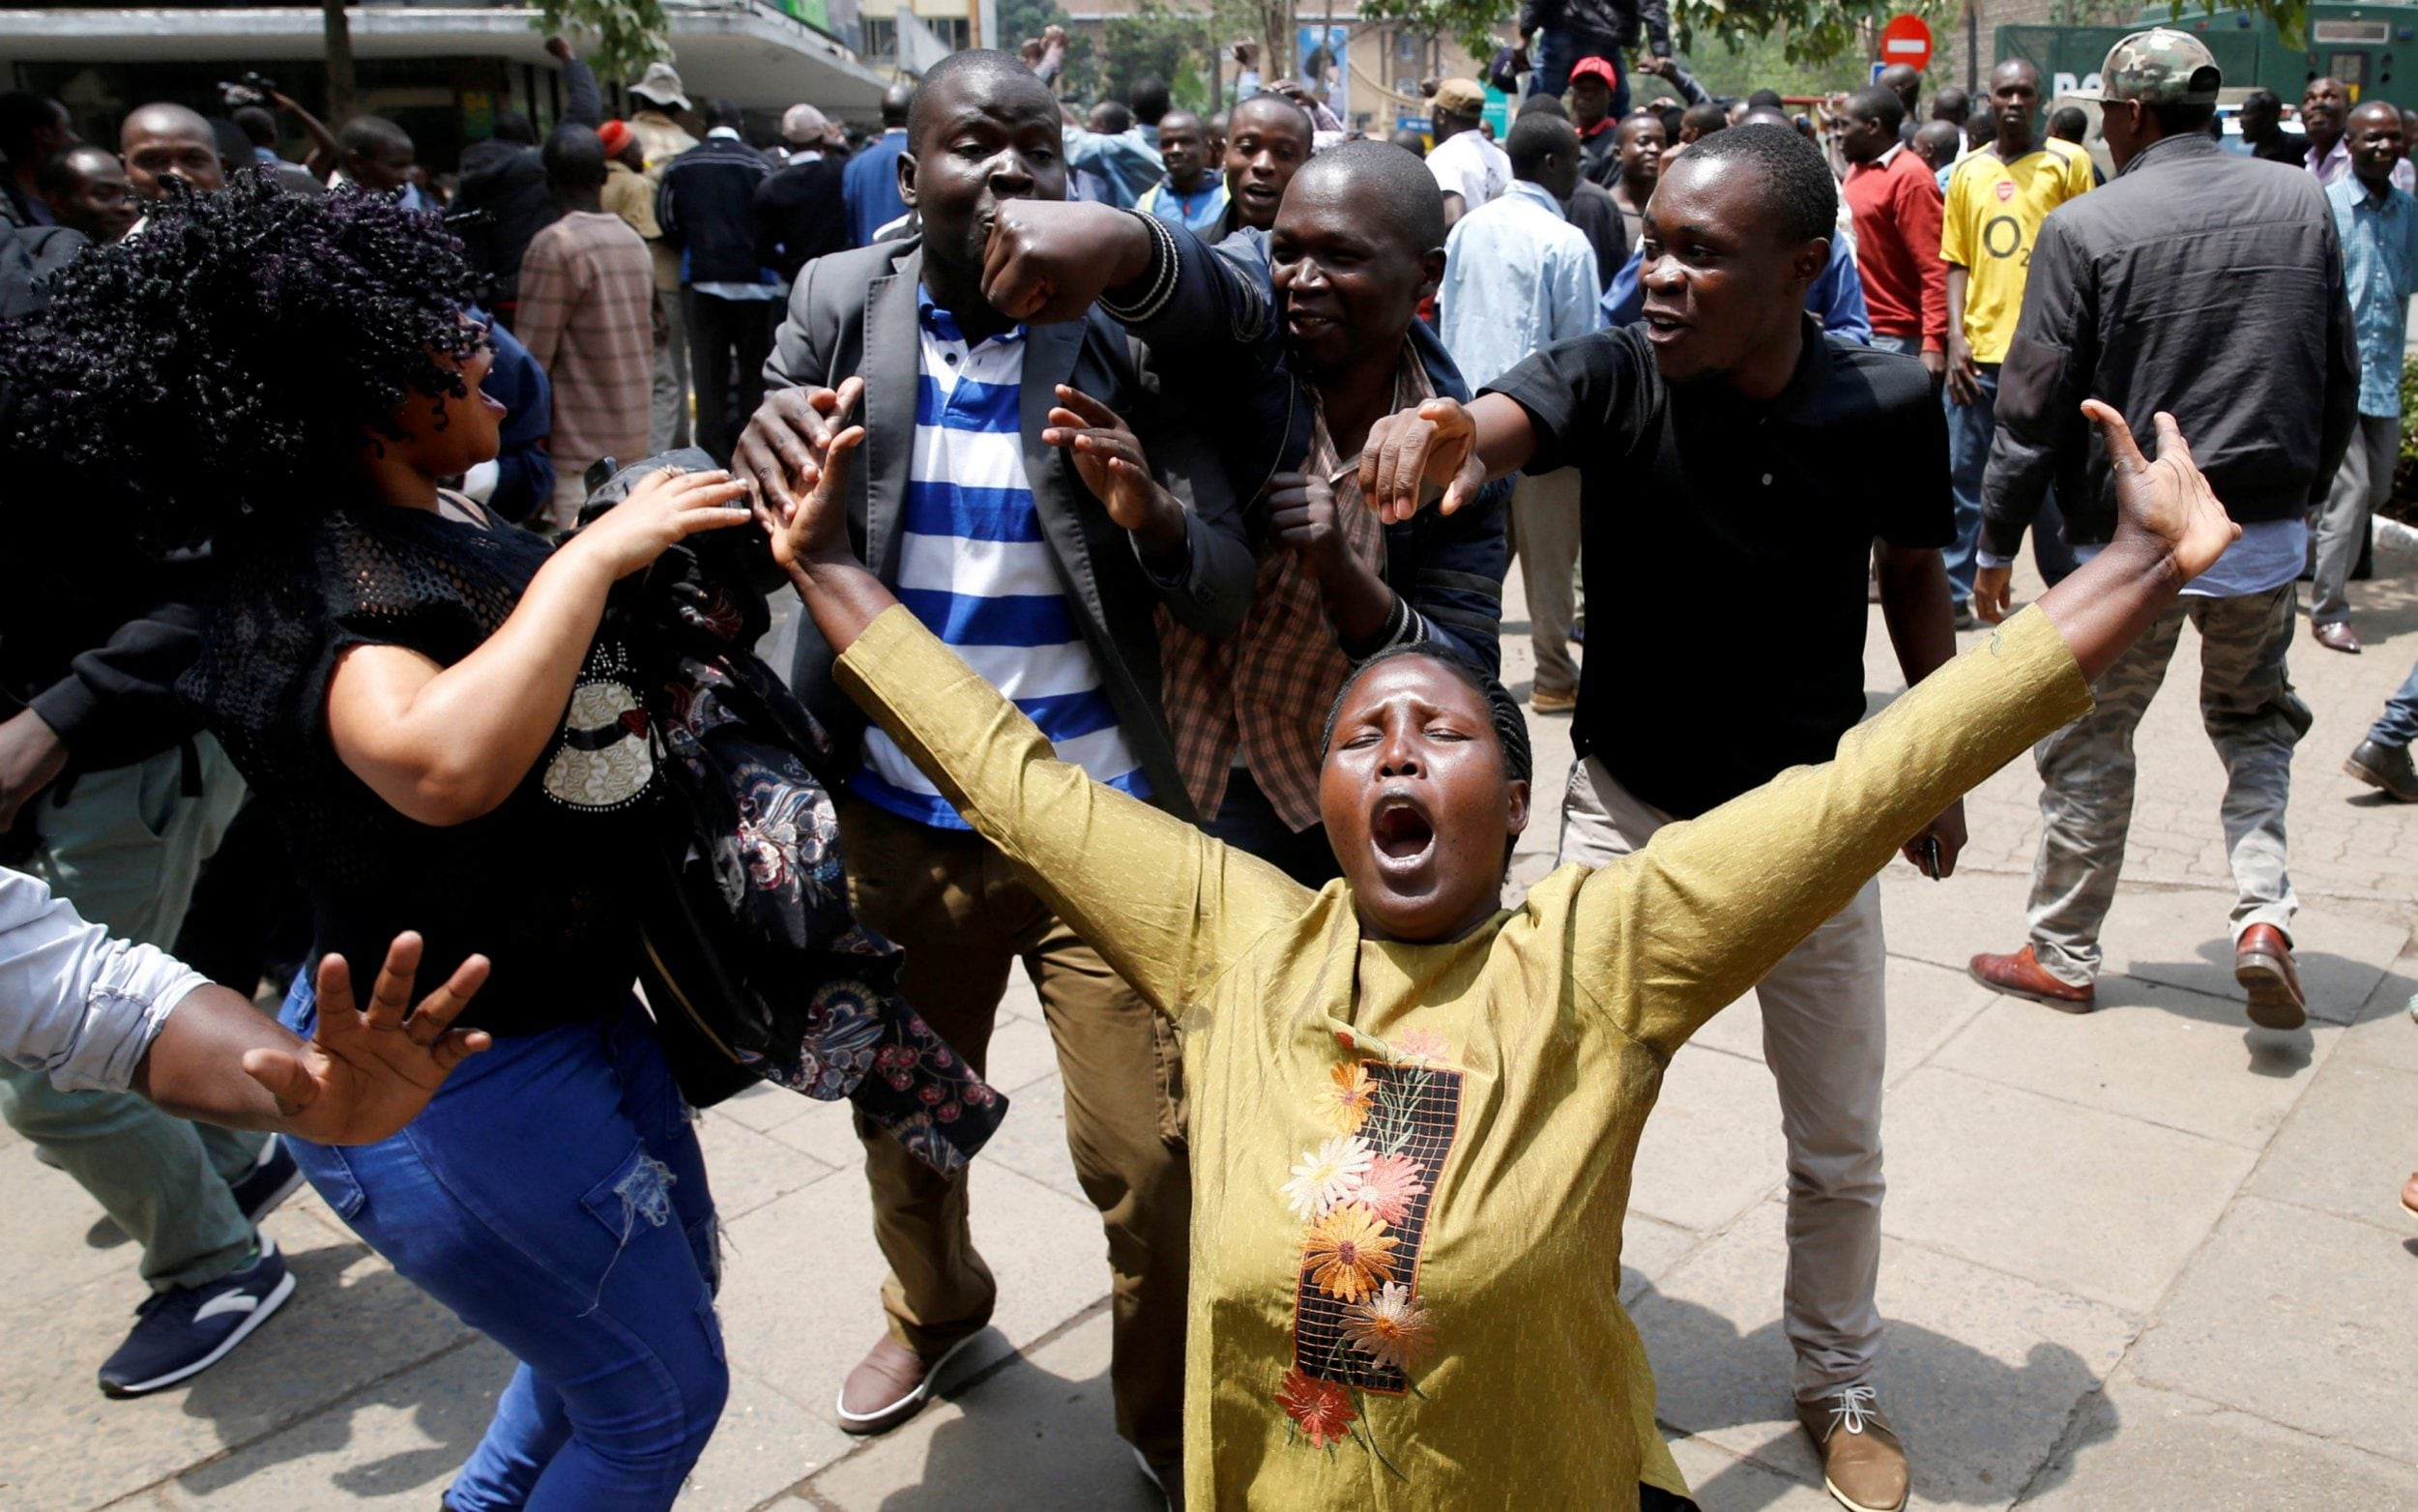 Supporters of opposition leader Raila Odinga cheer outside court